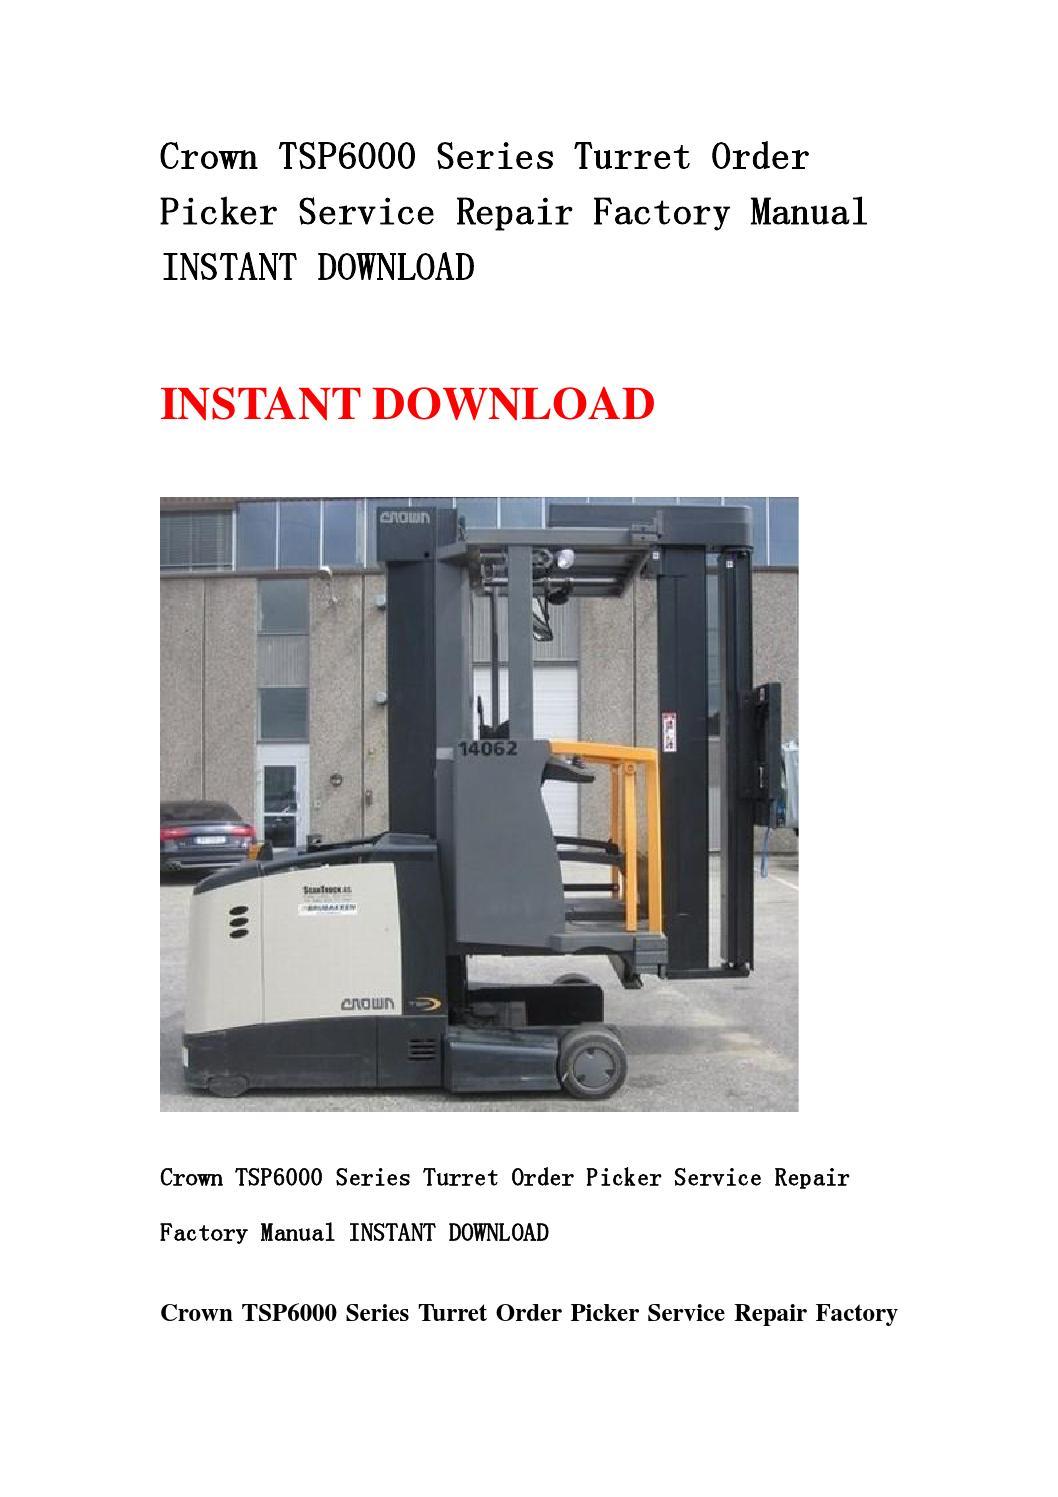 crown tsp 6000 service manual